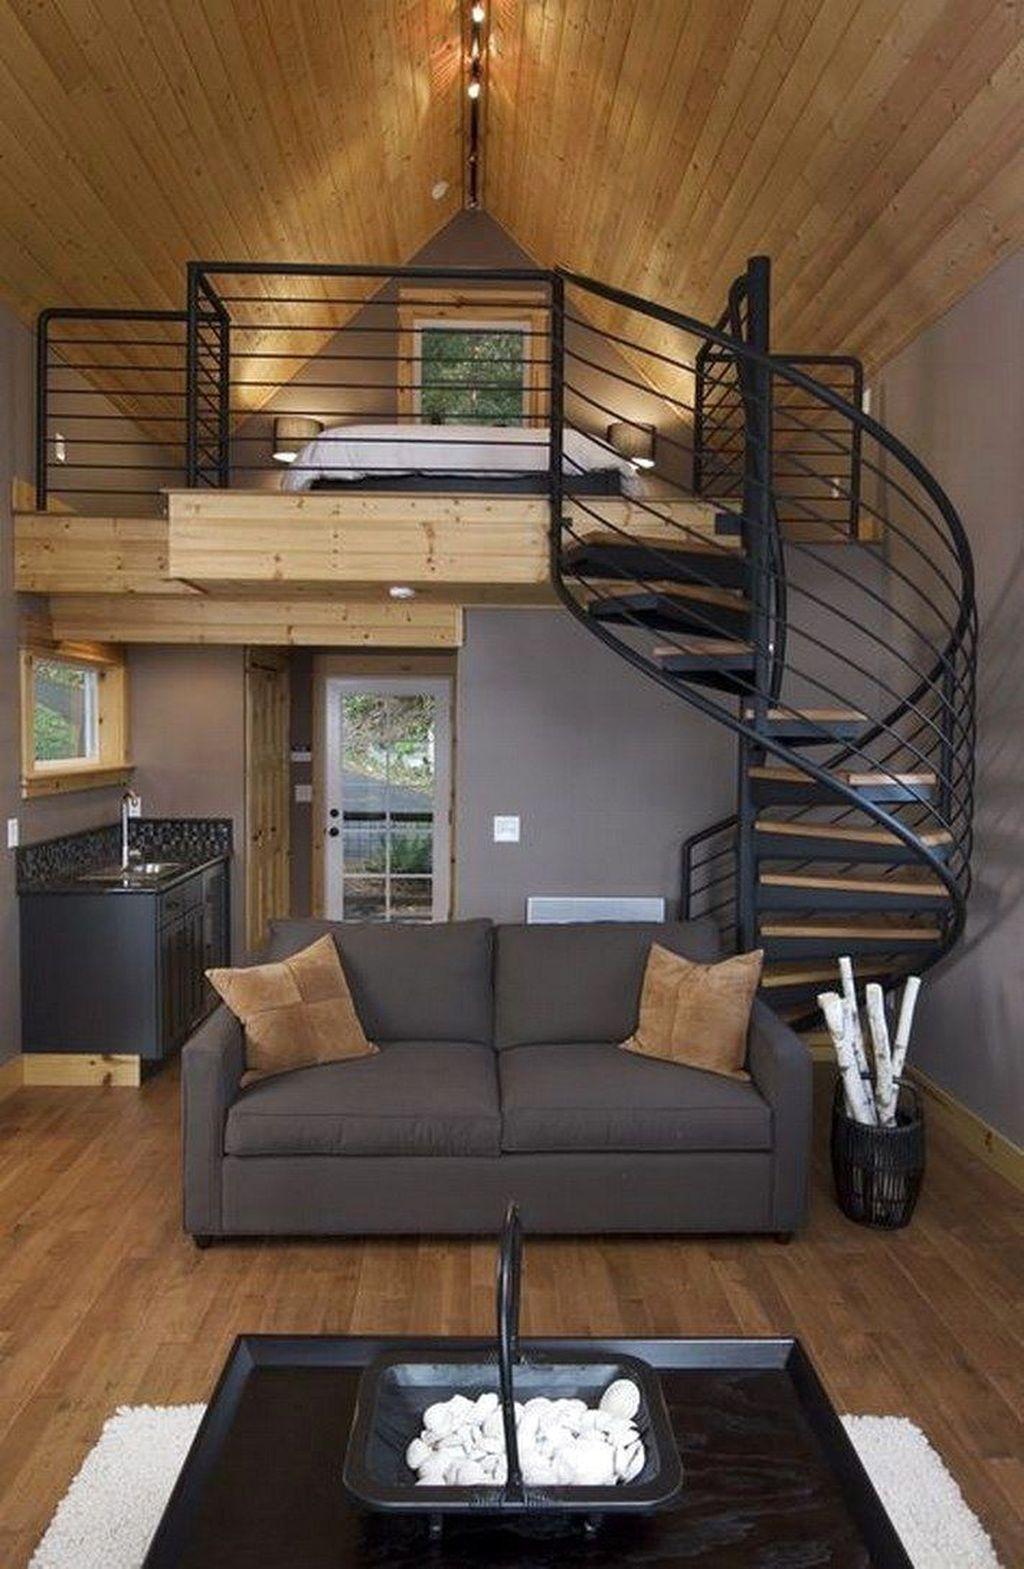 Fabulous Tiny House Design Ideas You Never Seen Before 12 1 Tiny